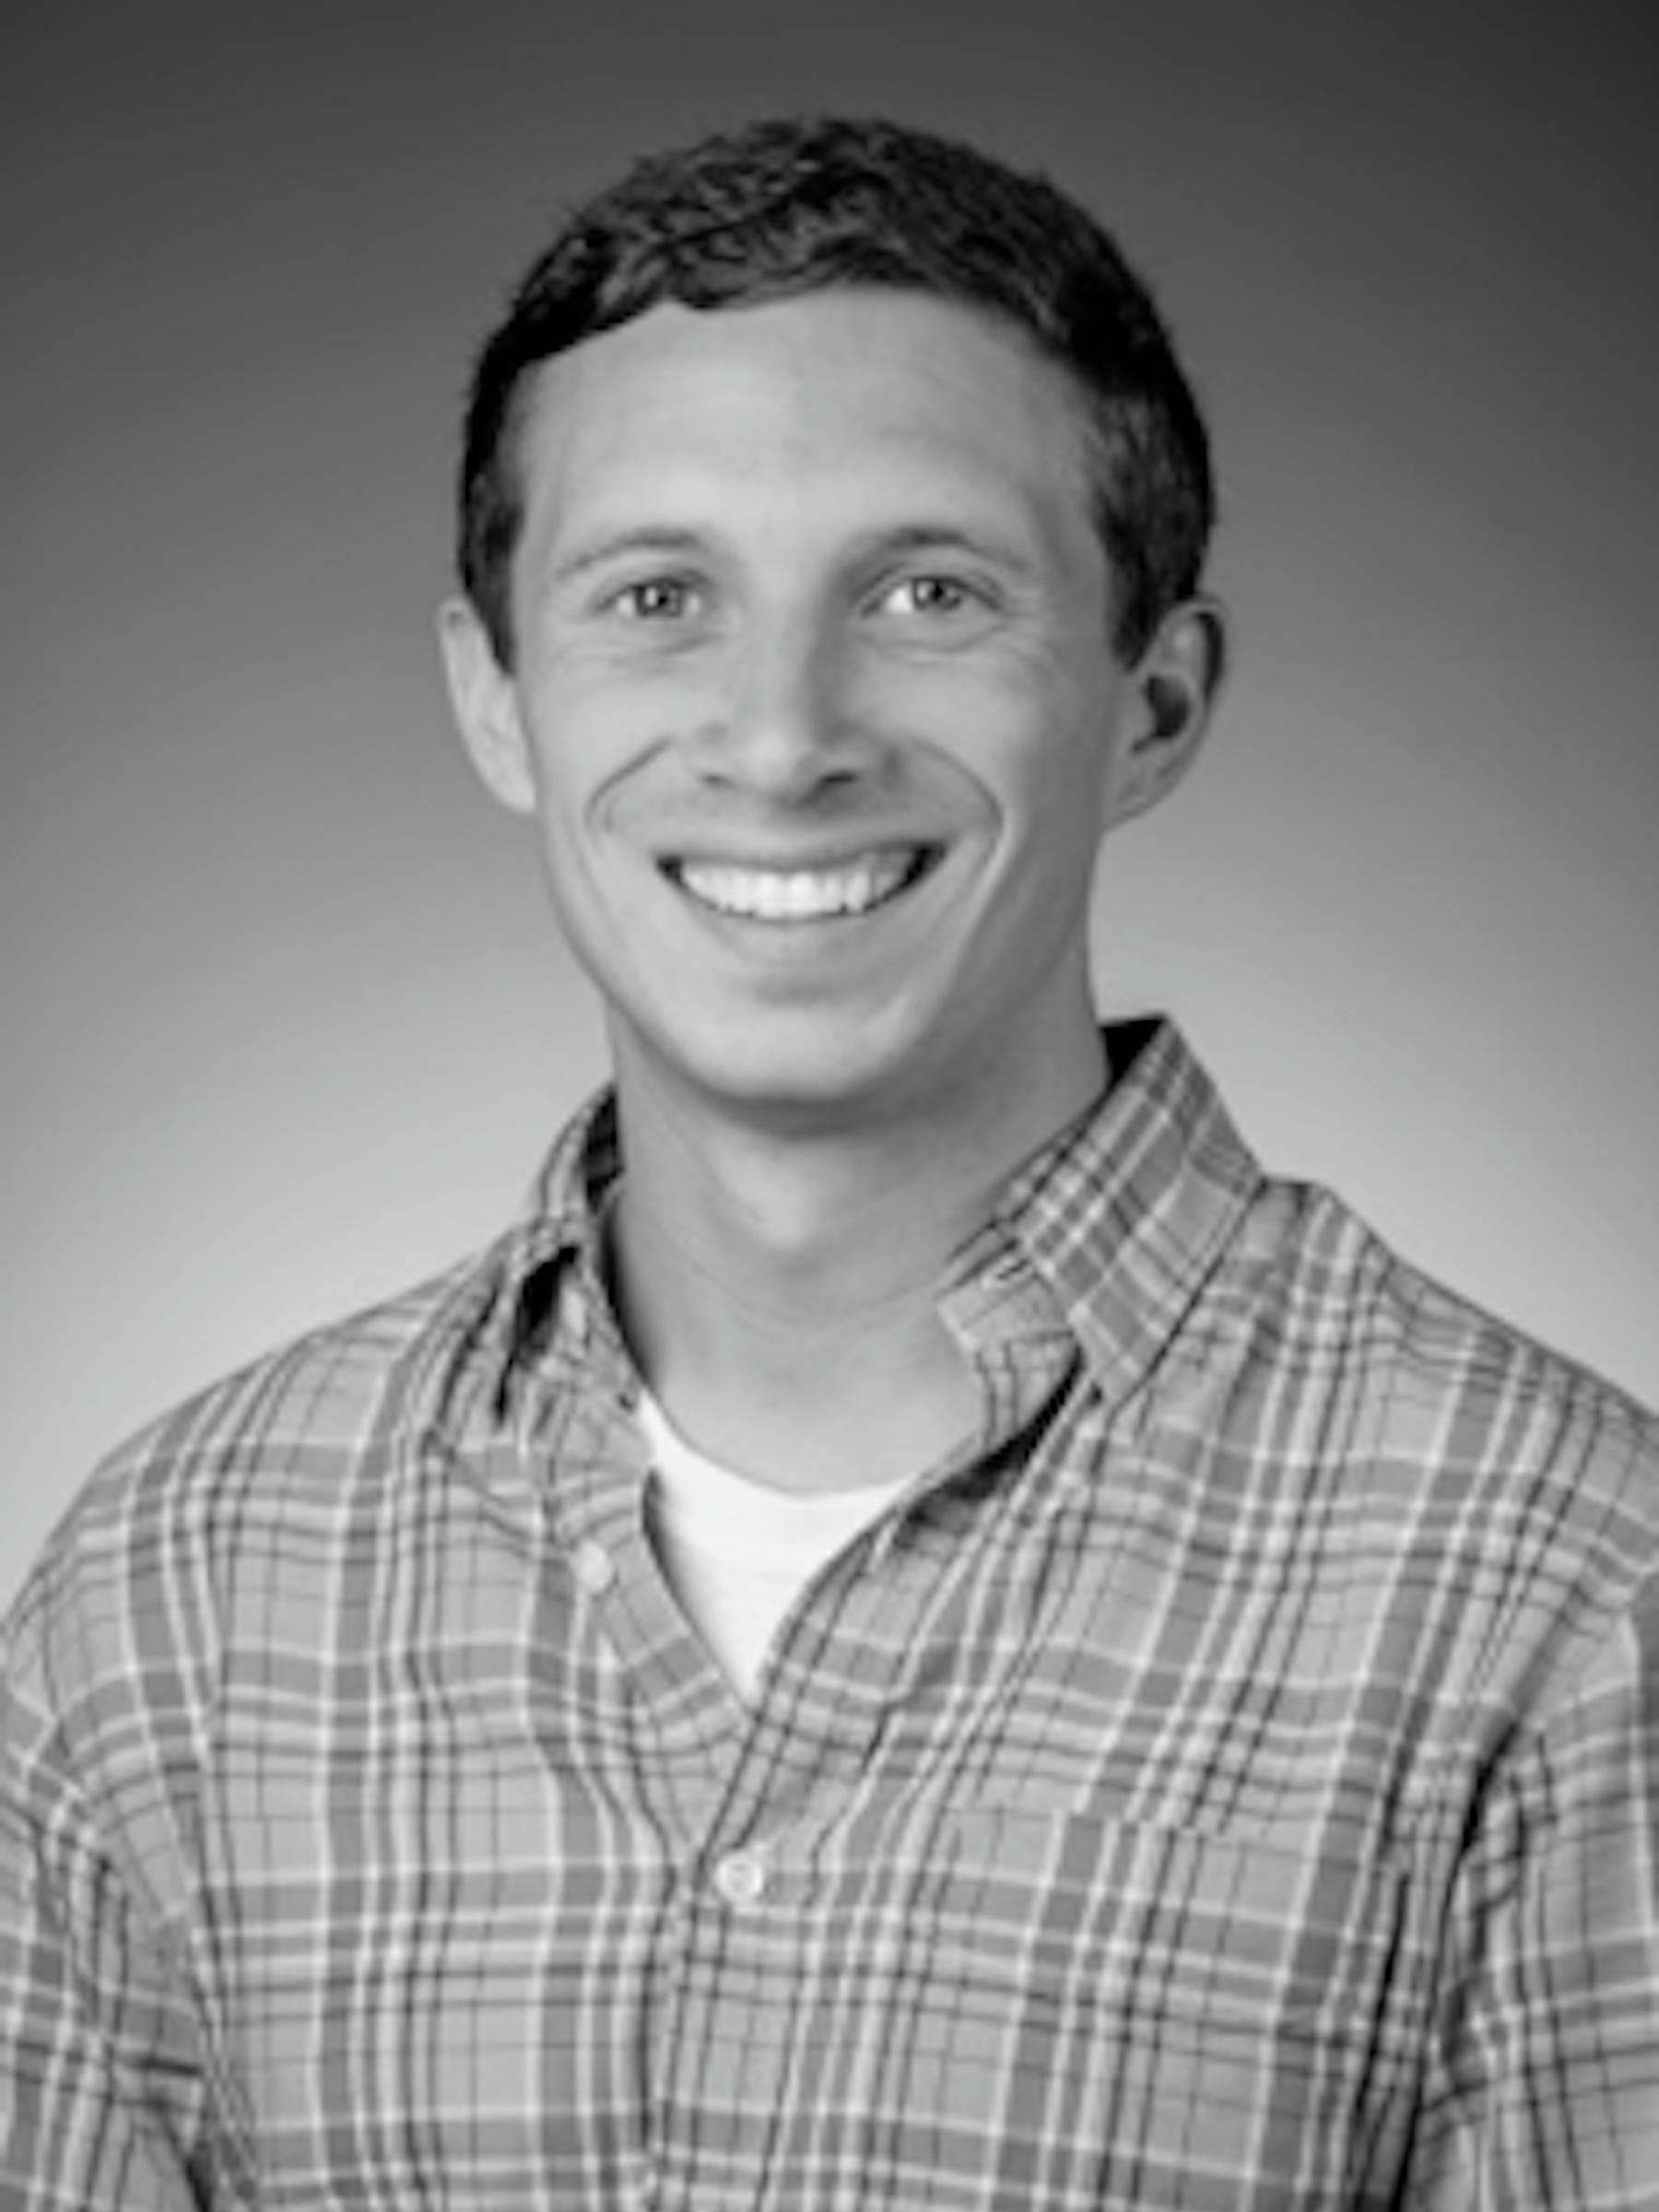 Austin Melcher, UCSB